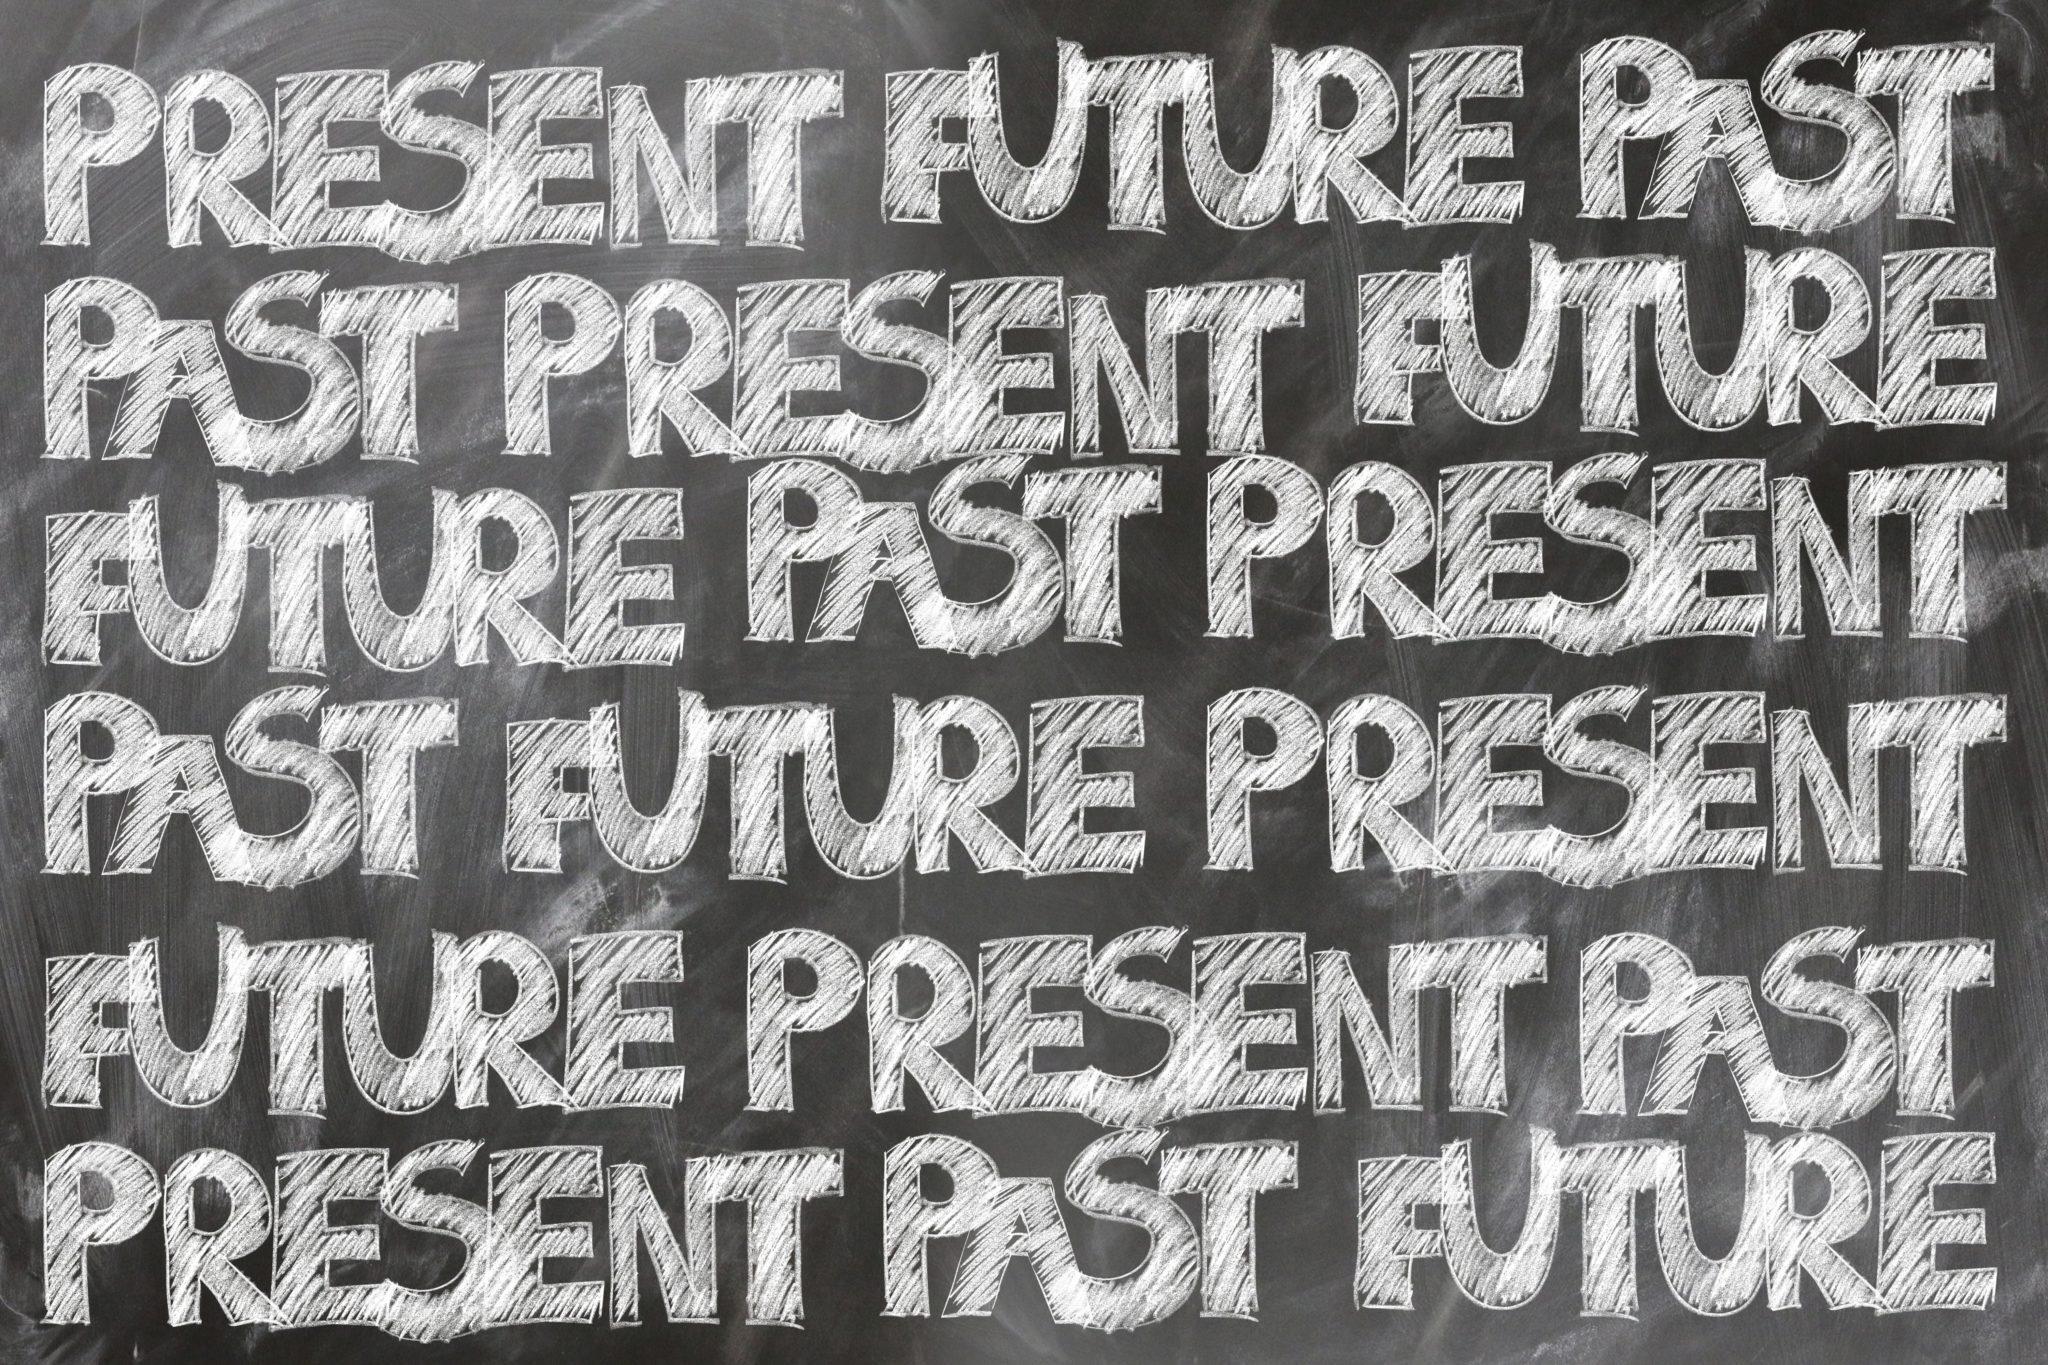 present future past